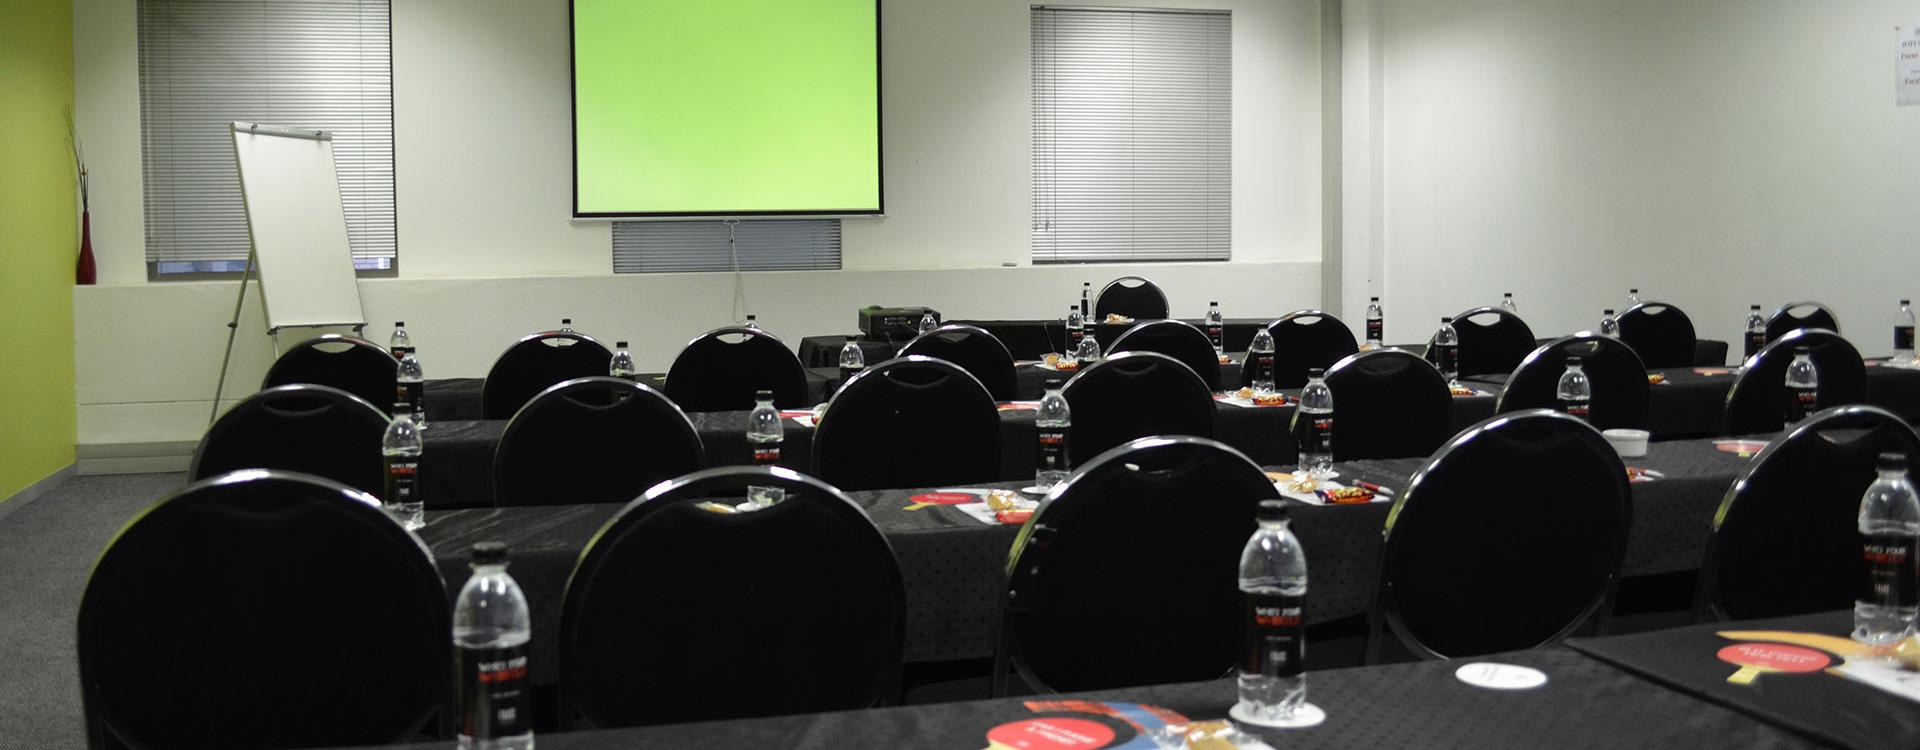 Atlantis - Brainstorming Room   Focus Rooms Conference Venue